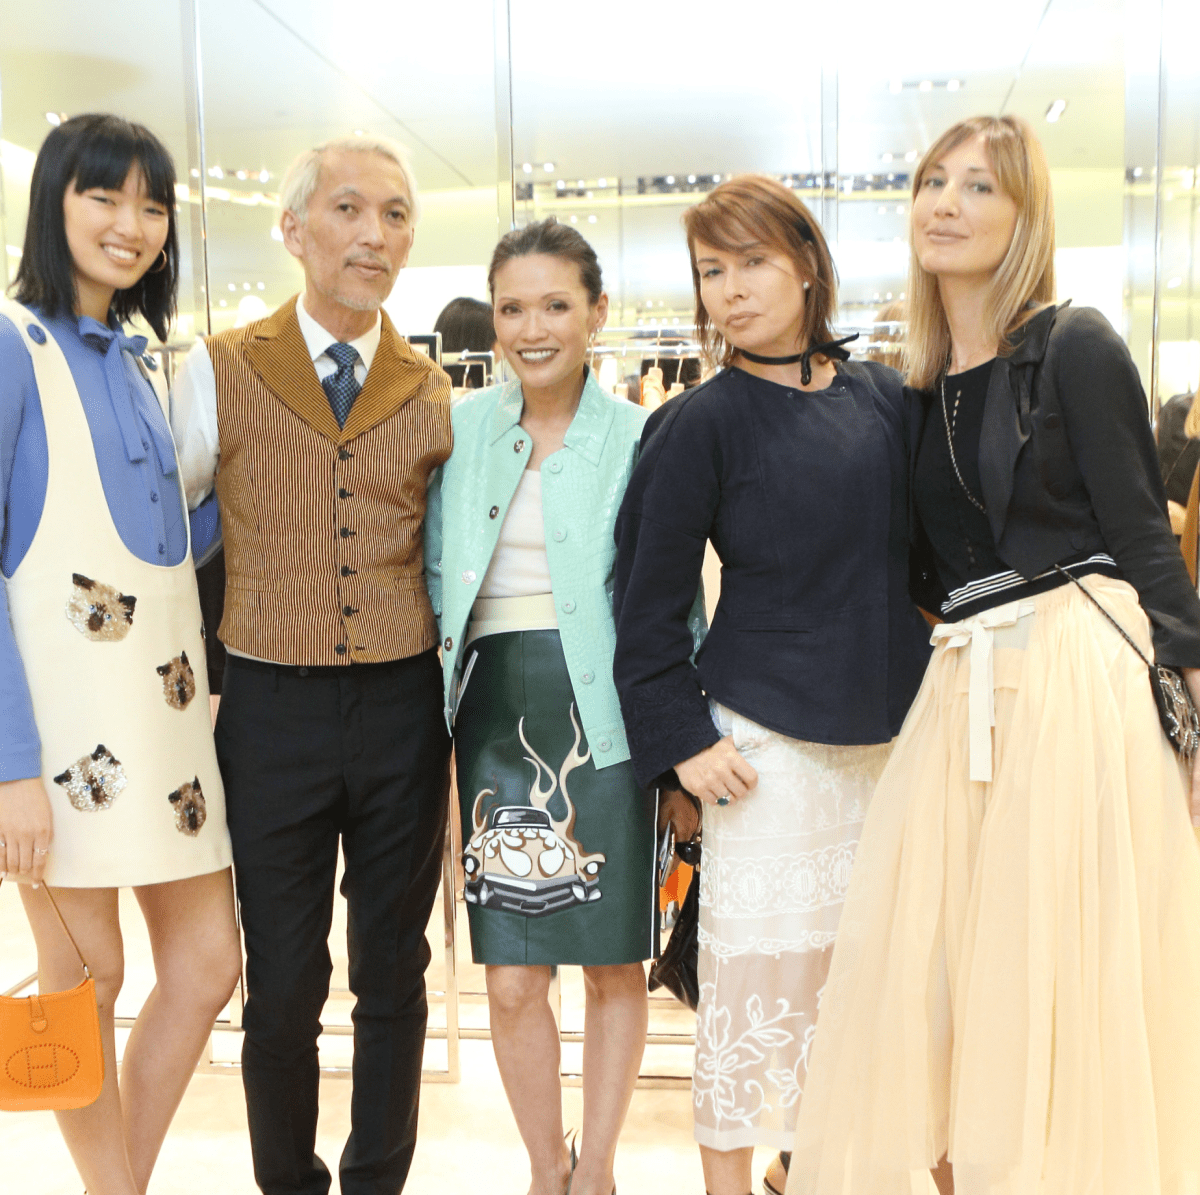 Chloe Nguyen, Marc Nguyen, Duyen Nguyen, Irina Litvak, Tatiana Massey at APAHA kickoff party at Prada